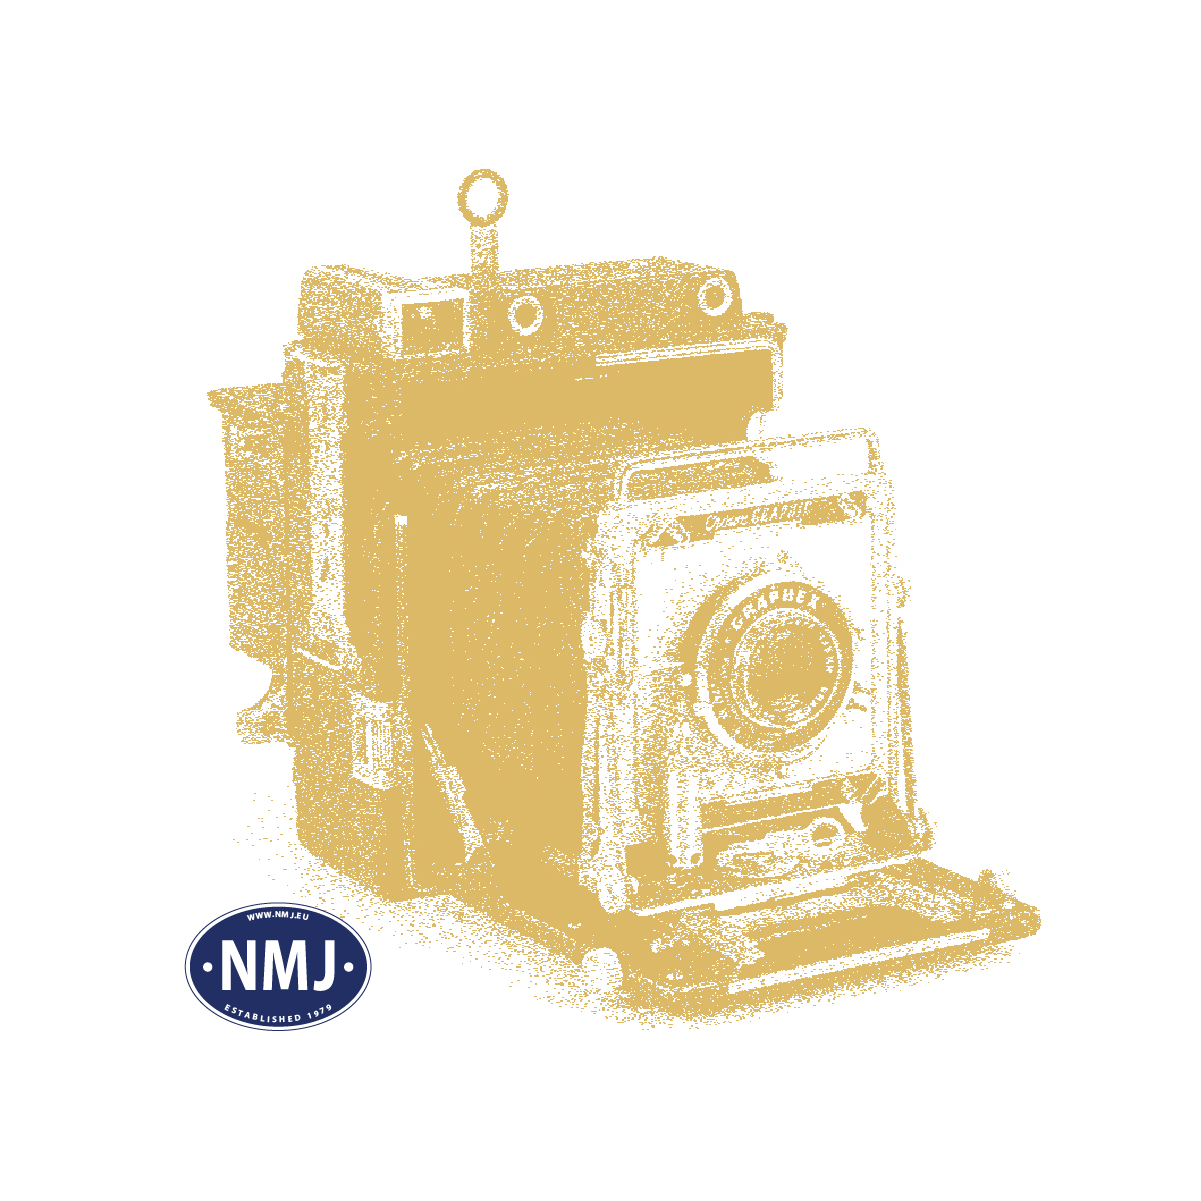 NMJT245302 - NMJ Topline CFL 1603, 0-Skala, DCC m/Lyd